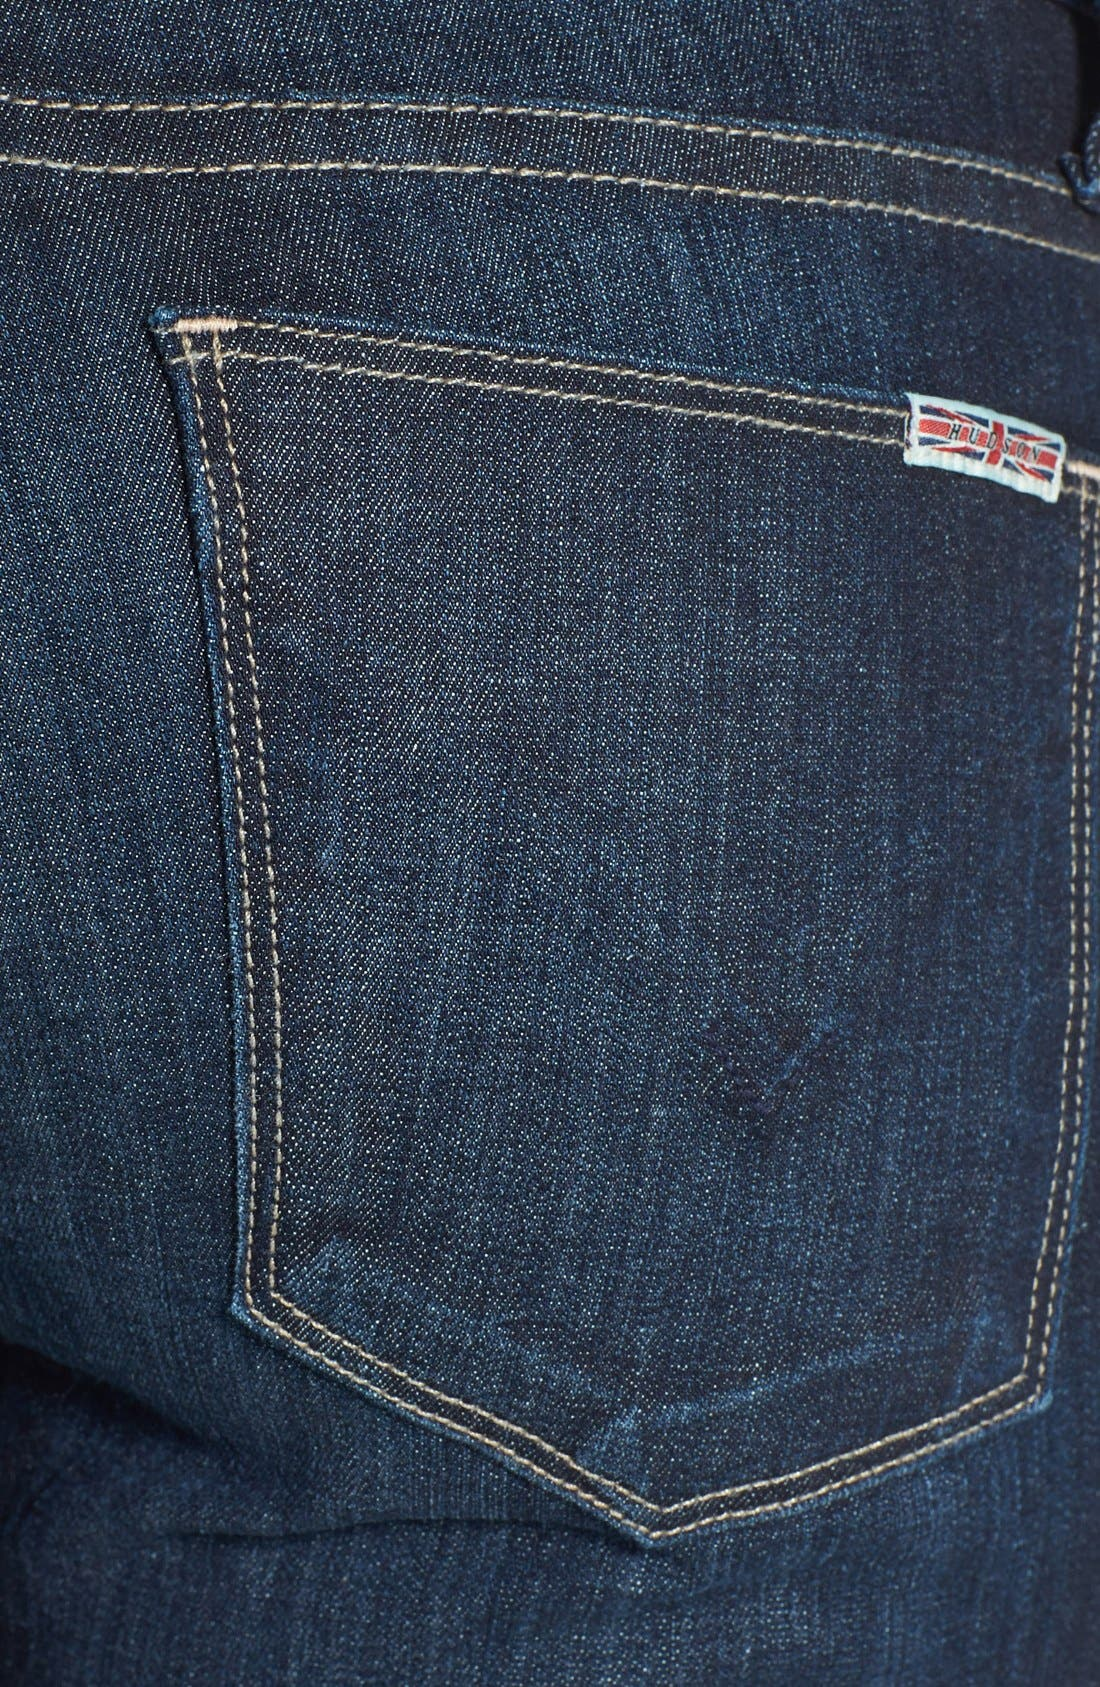 Alternate Image 3  - Hudson Jeans 'Collette' Mid Rise Skinny Jeans (Skyline)